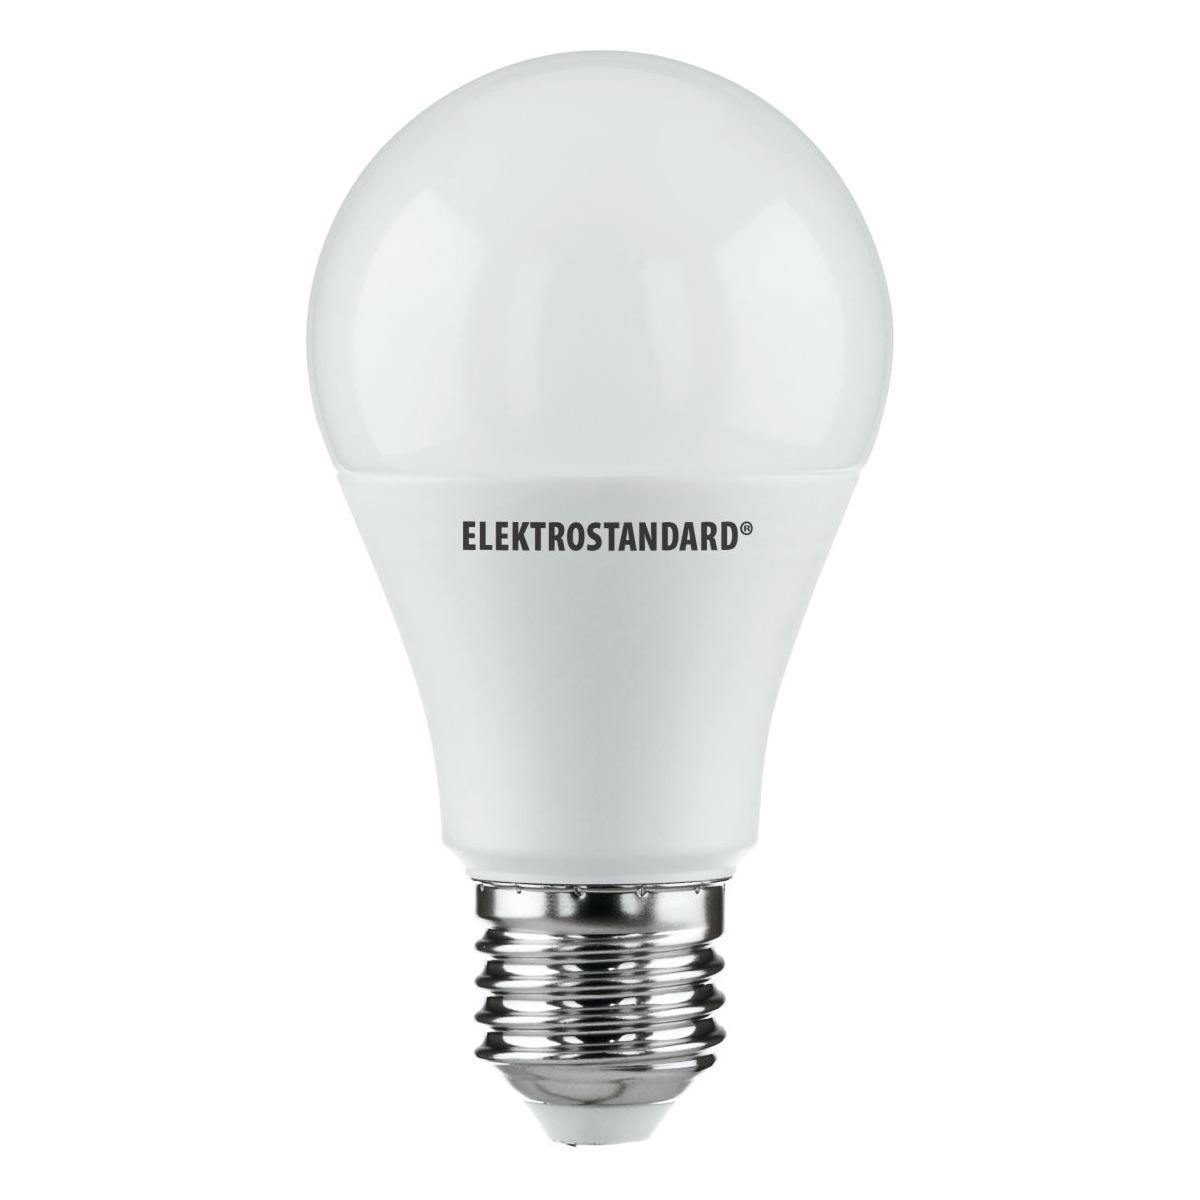 elektrostandard лампа светодиодная elektrostandard classic led d 10w 4200k e27 4690389085543 Лампа светодиодная LED E27 17W 4200K матовая 4690389086014